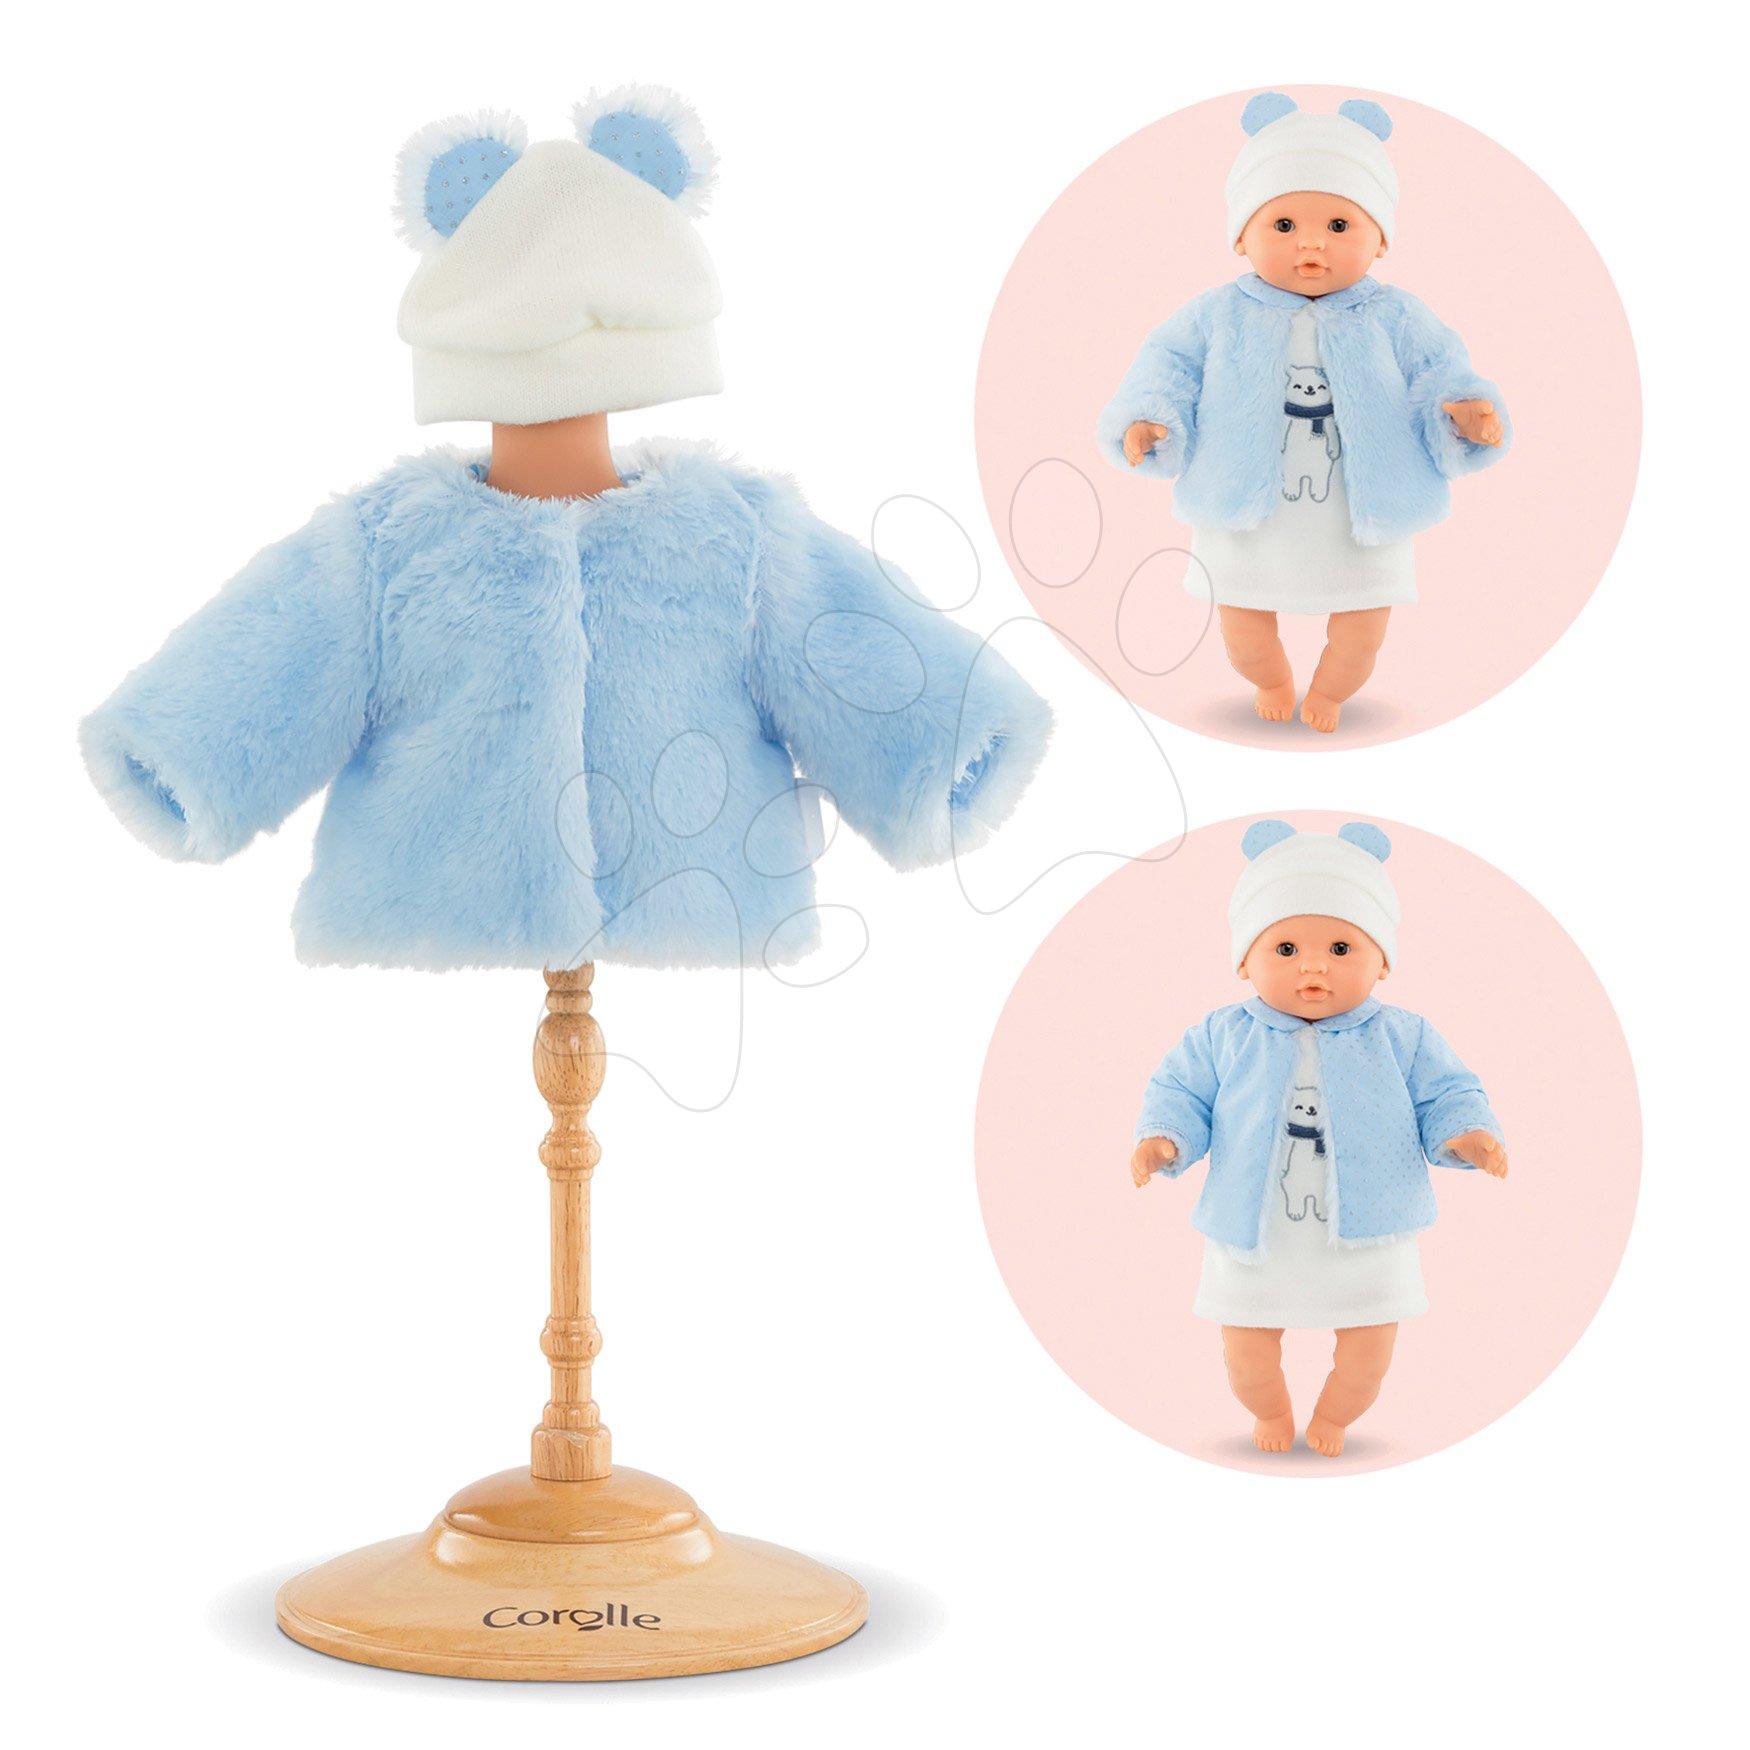 Oblečenie Coat Winter Sparkle Corolle pre 30 cm bábiku od 18 mes